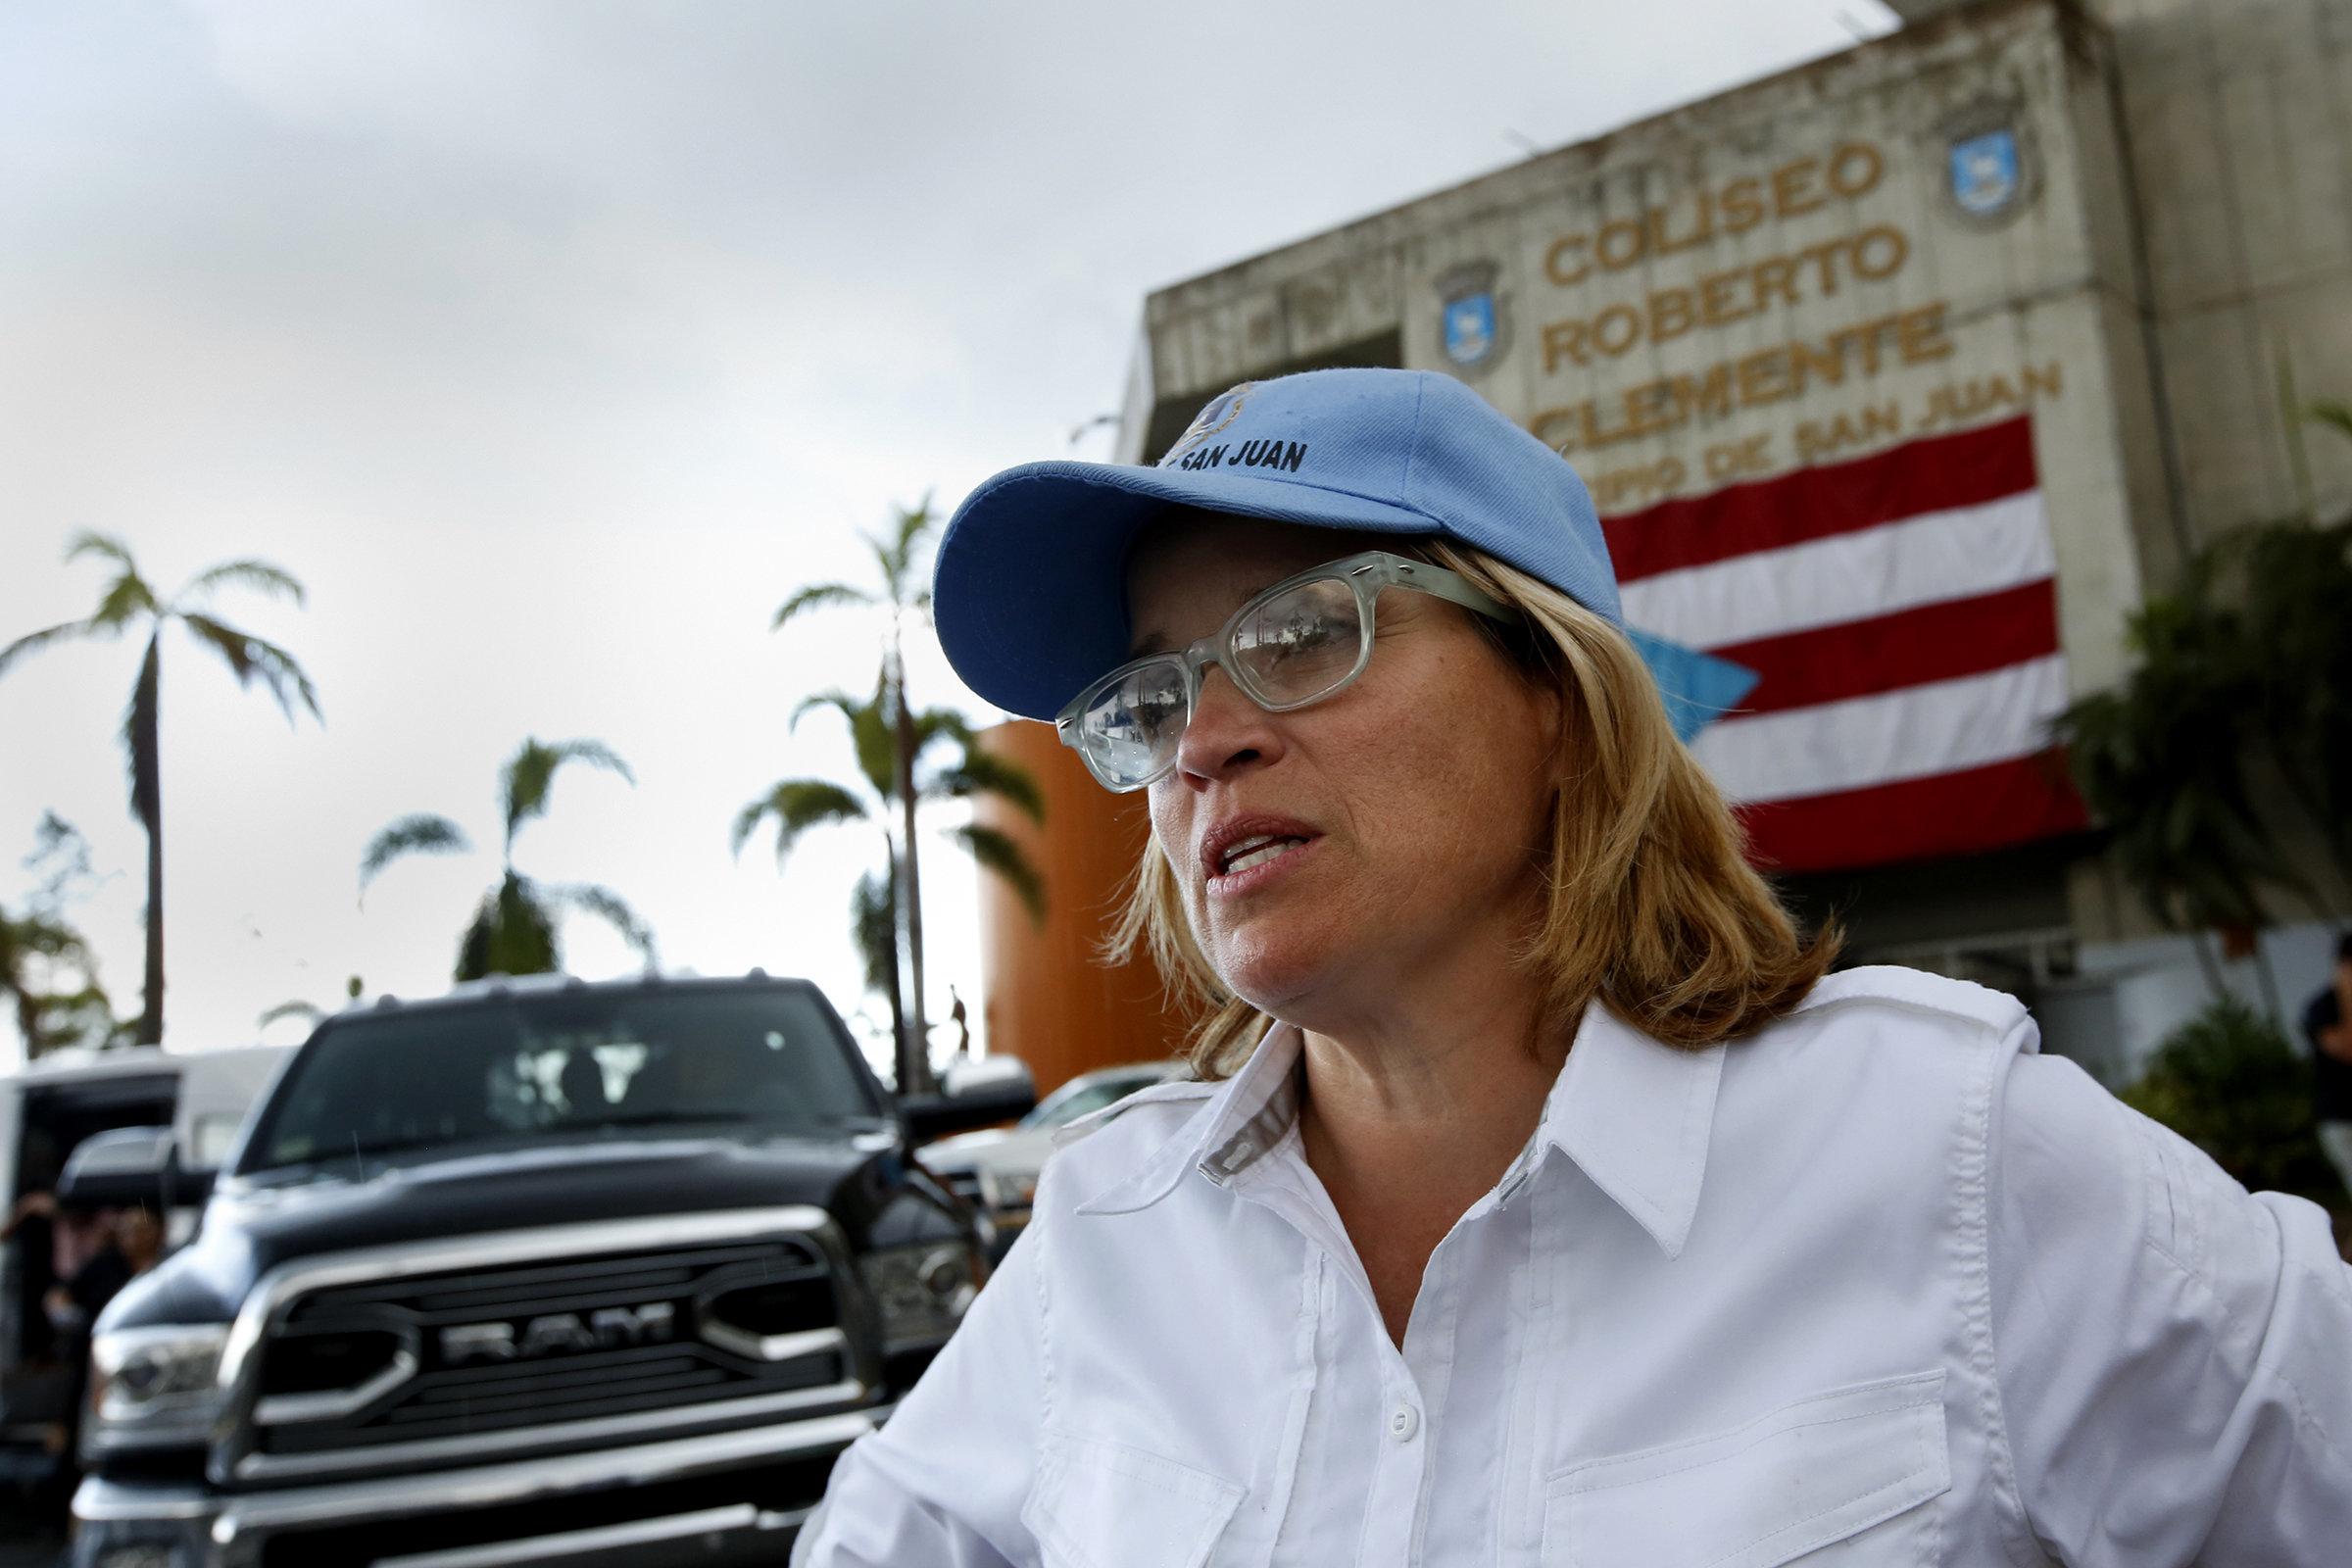 San Juan Mayor: It May Be Easy To Disregard Puerto Rico Because We're A US Colony